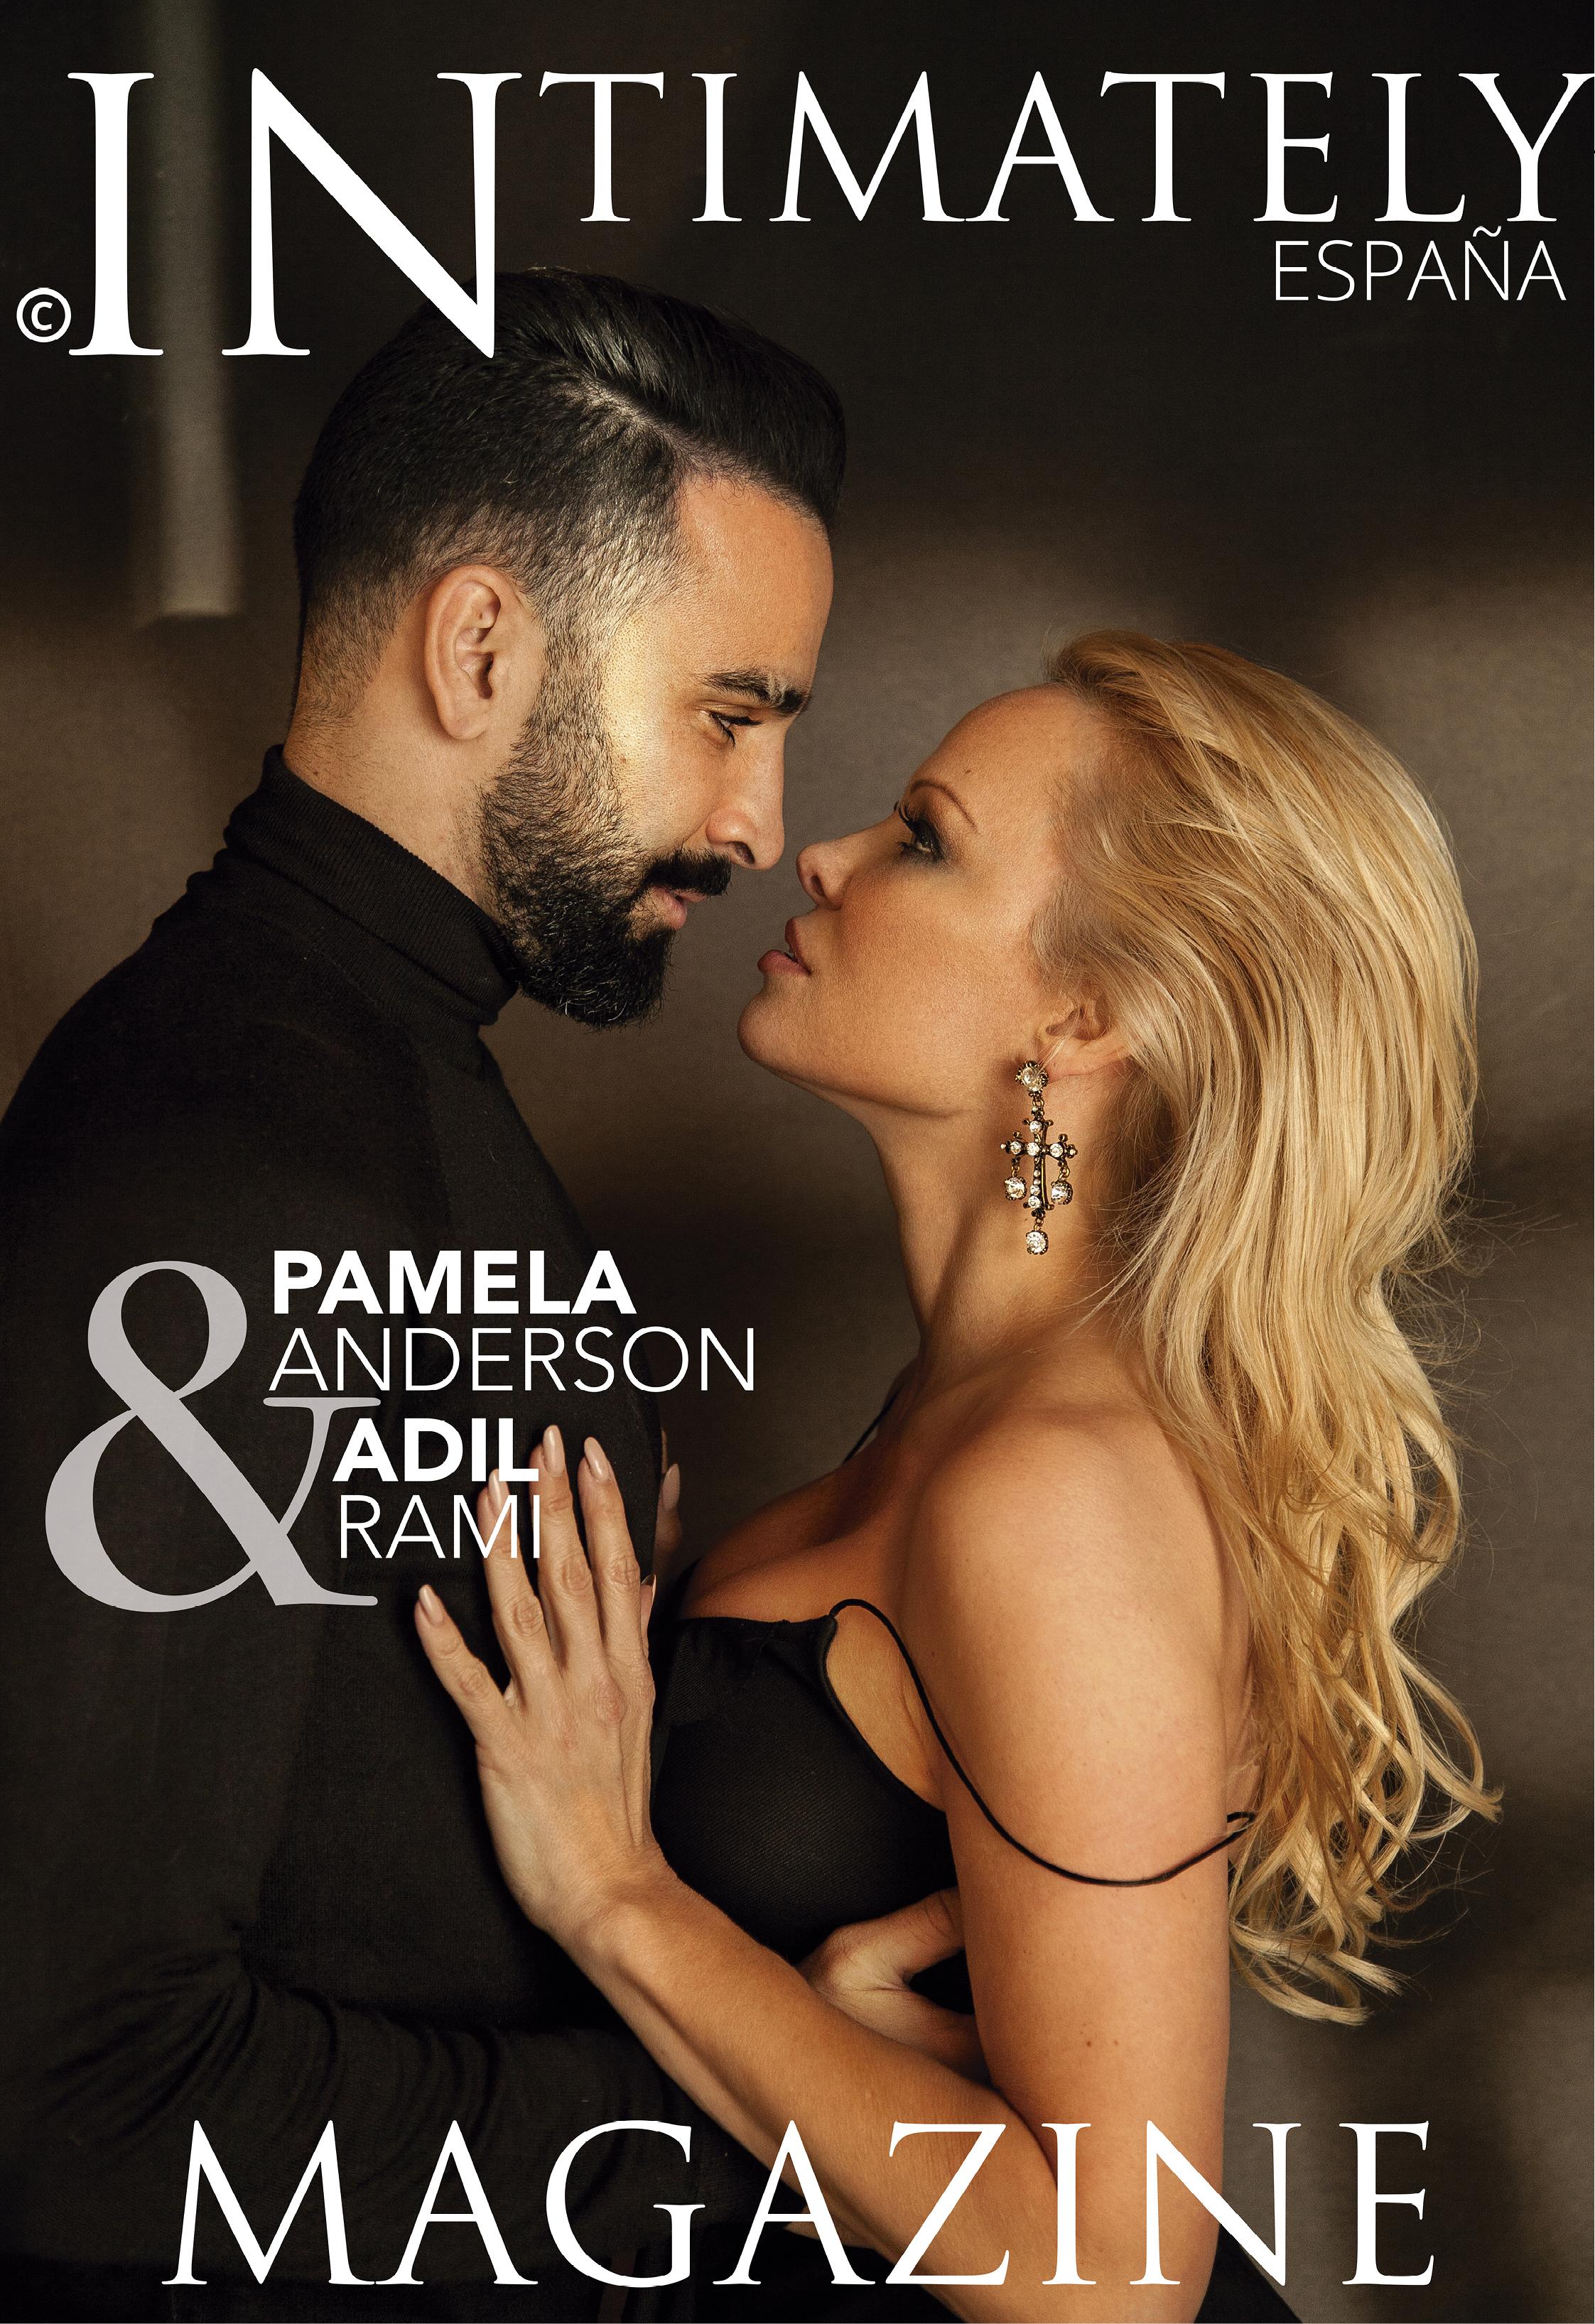 CA portada_intimately magazine Pamela Anderson Adil Rami M.jpg